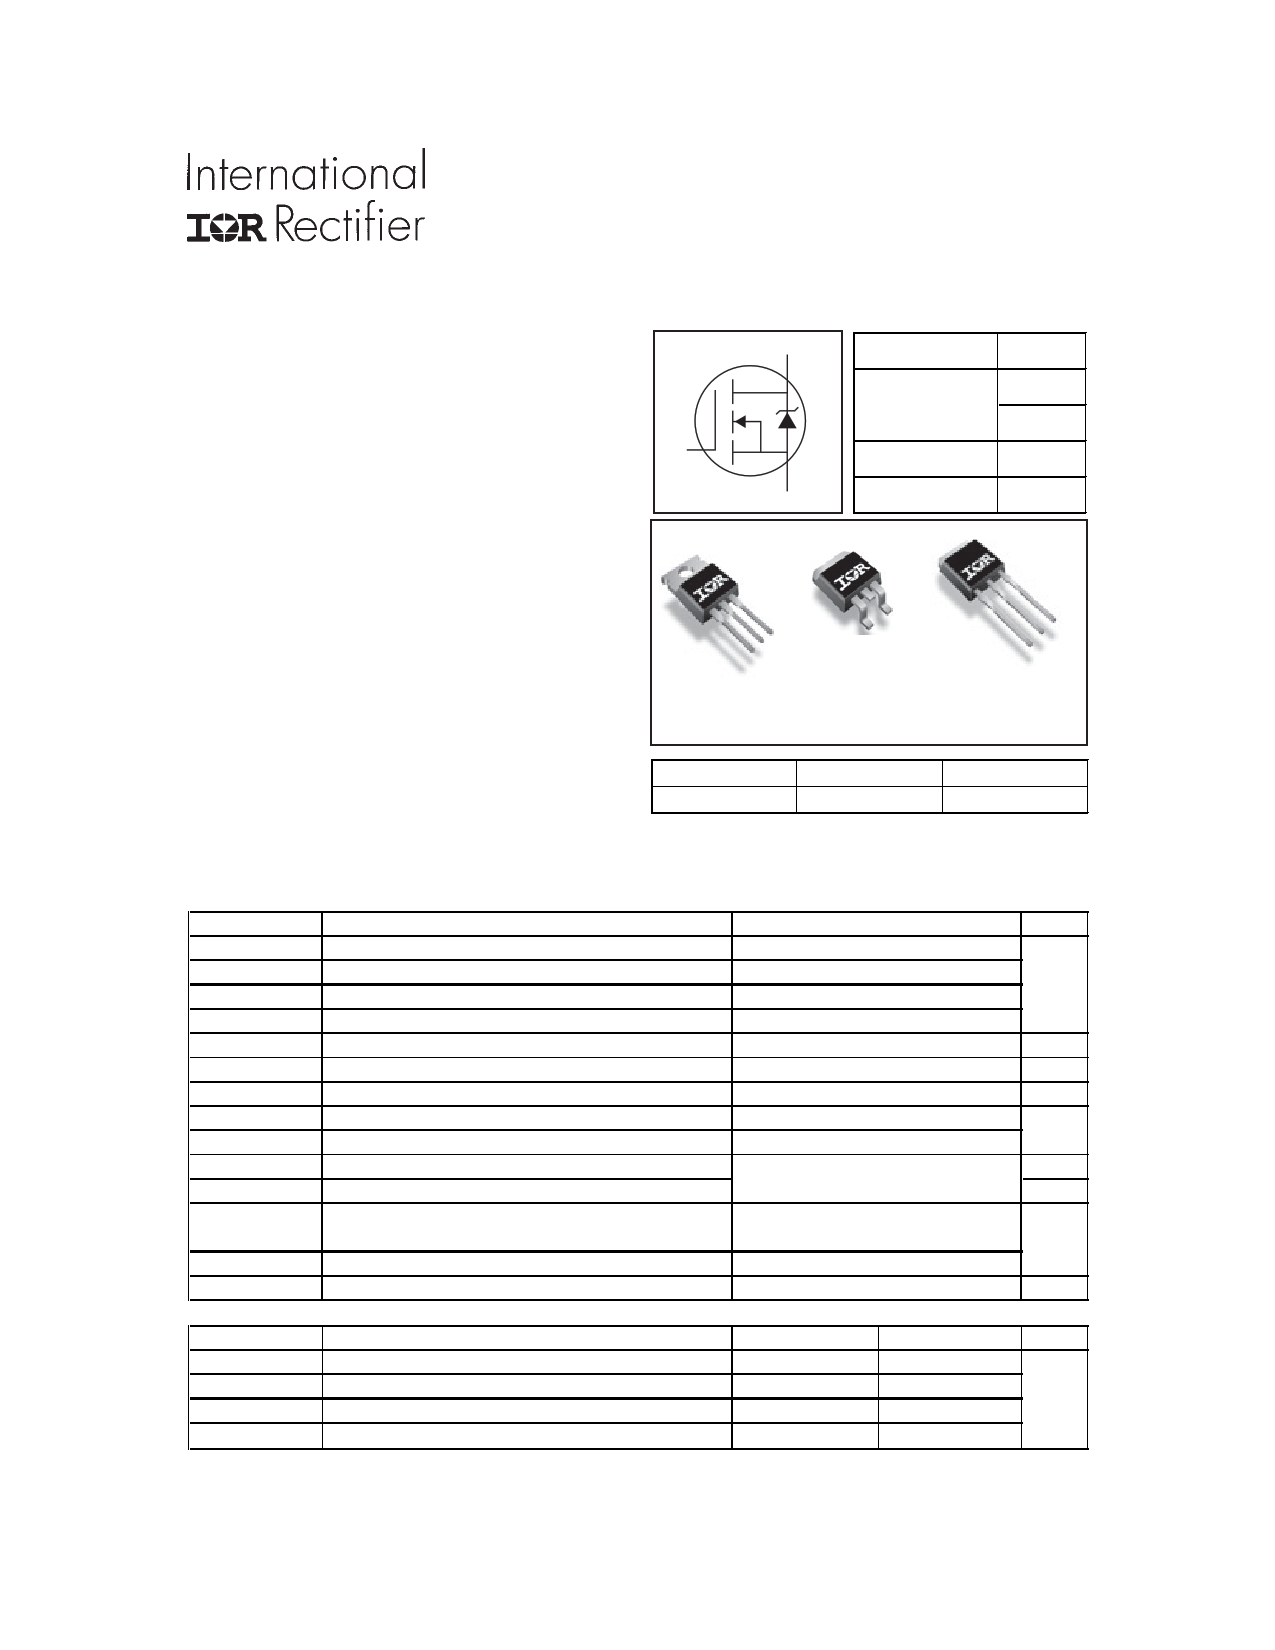 AUIRL1404ZS datasheet, circuit